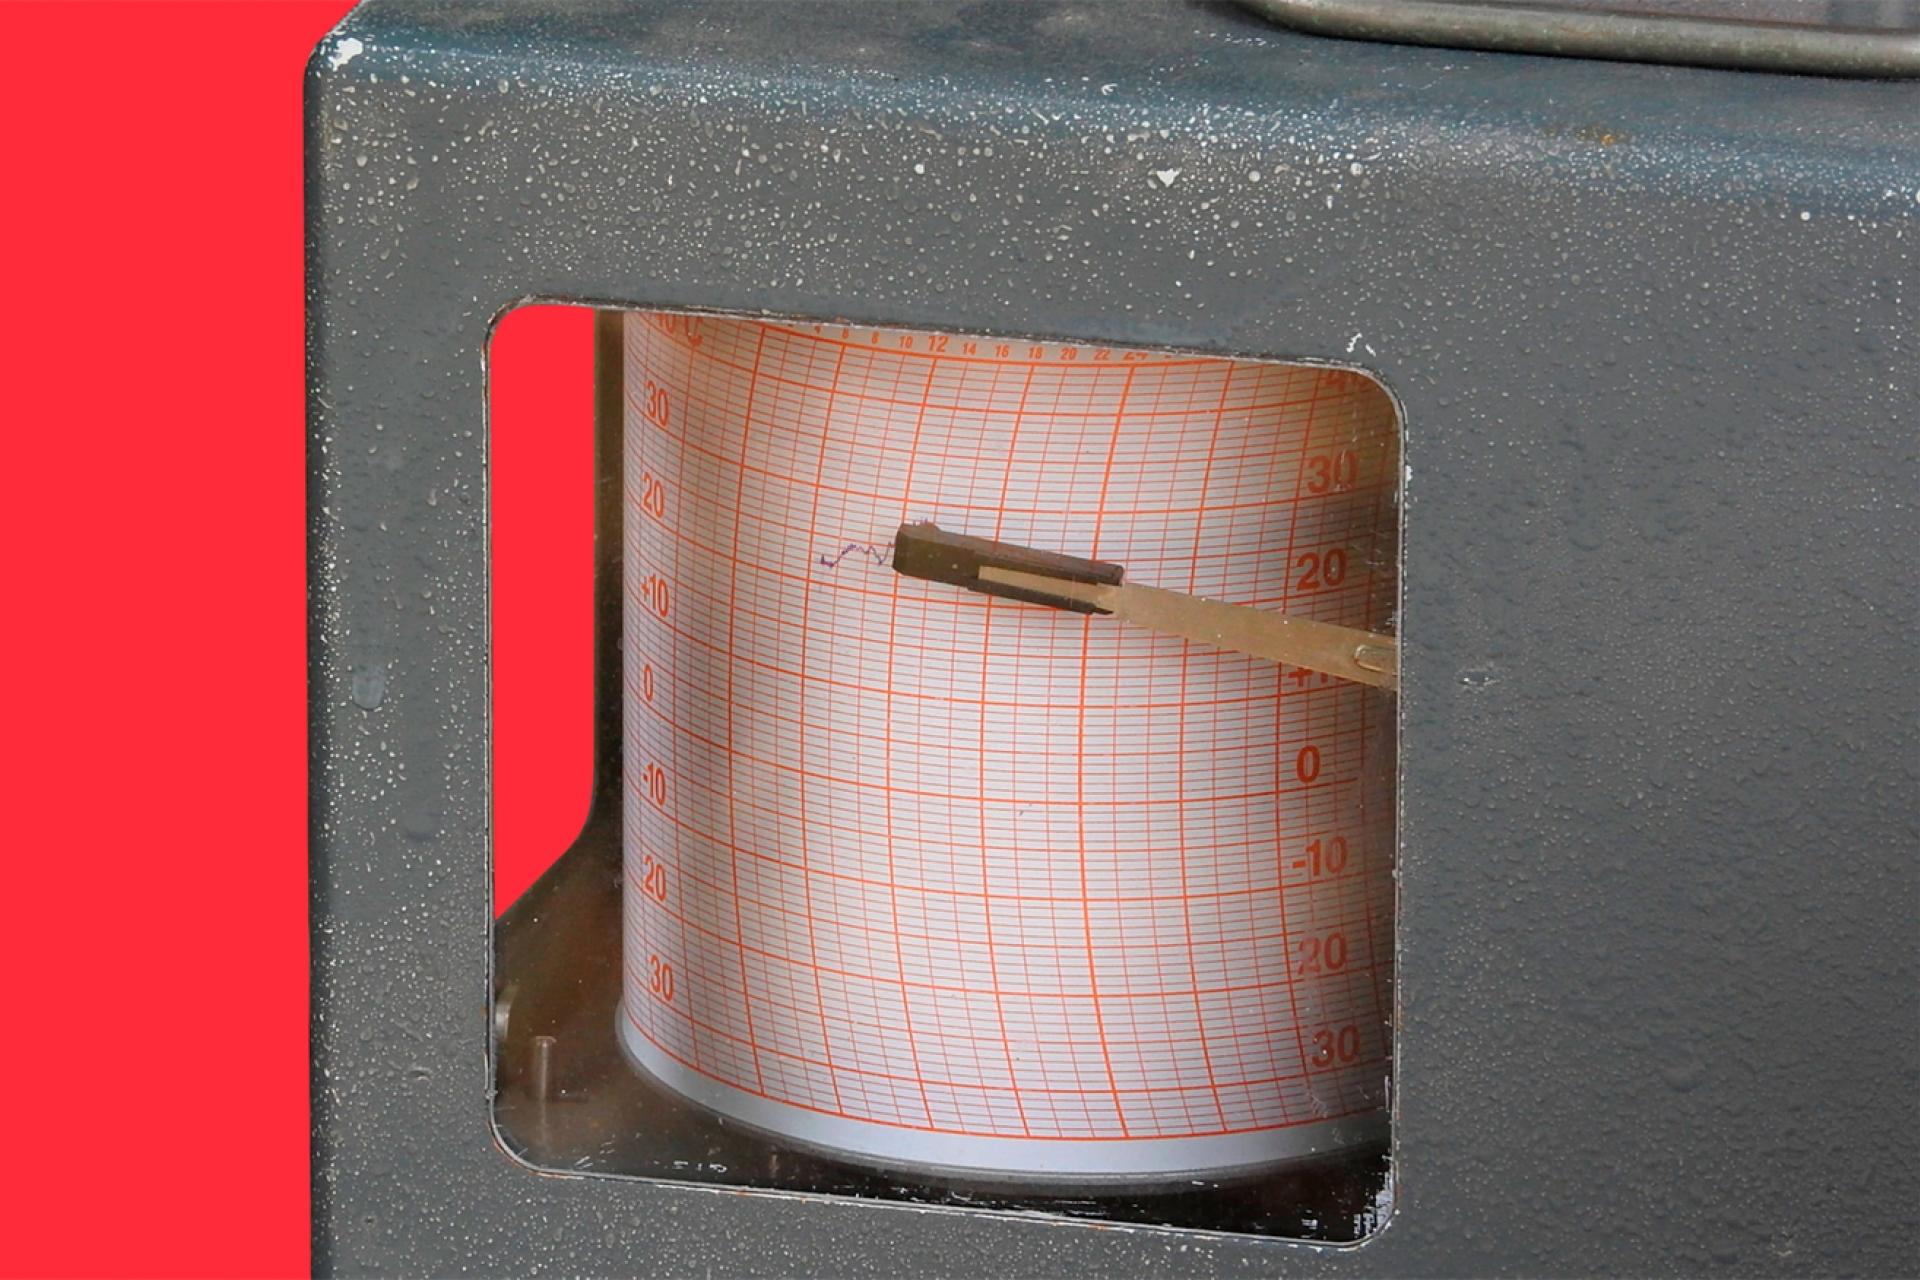 A Gas Flow Chart OCR solution